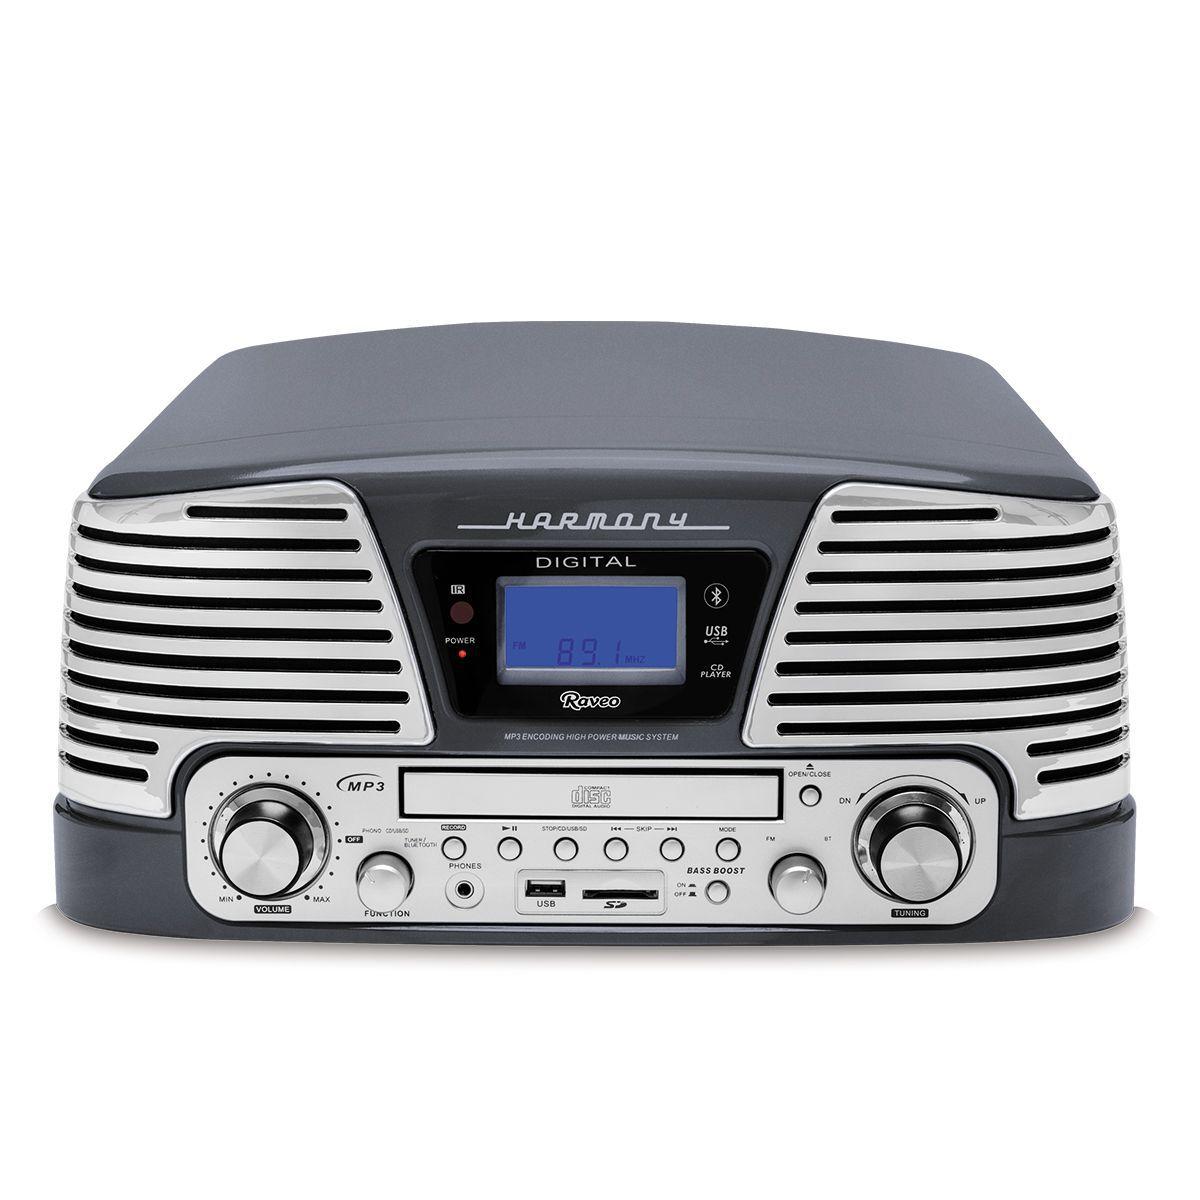 Vitrola Raveo Harmony Preto C/ Toca Discos, CD, BT, USB E SD - Selo Anatel